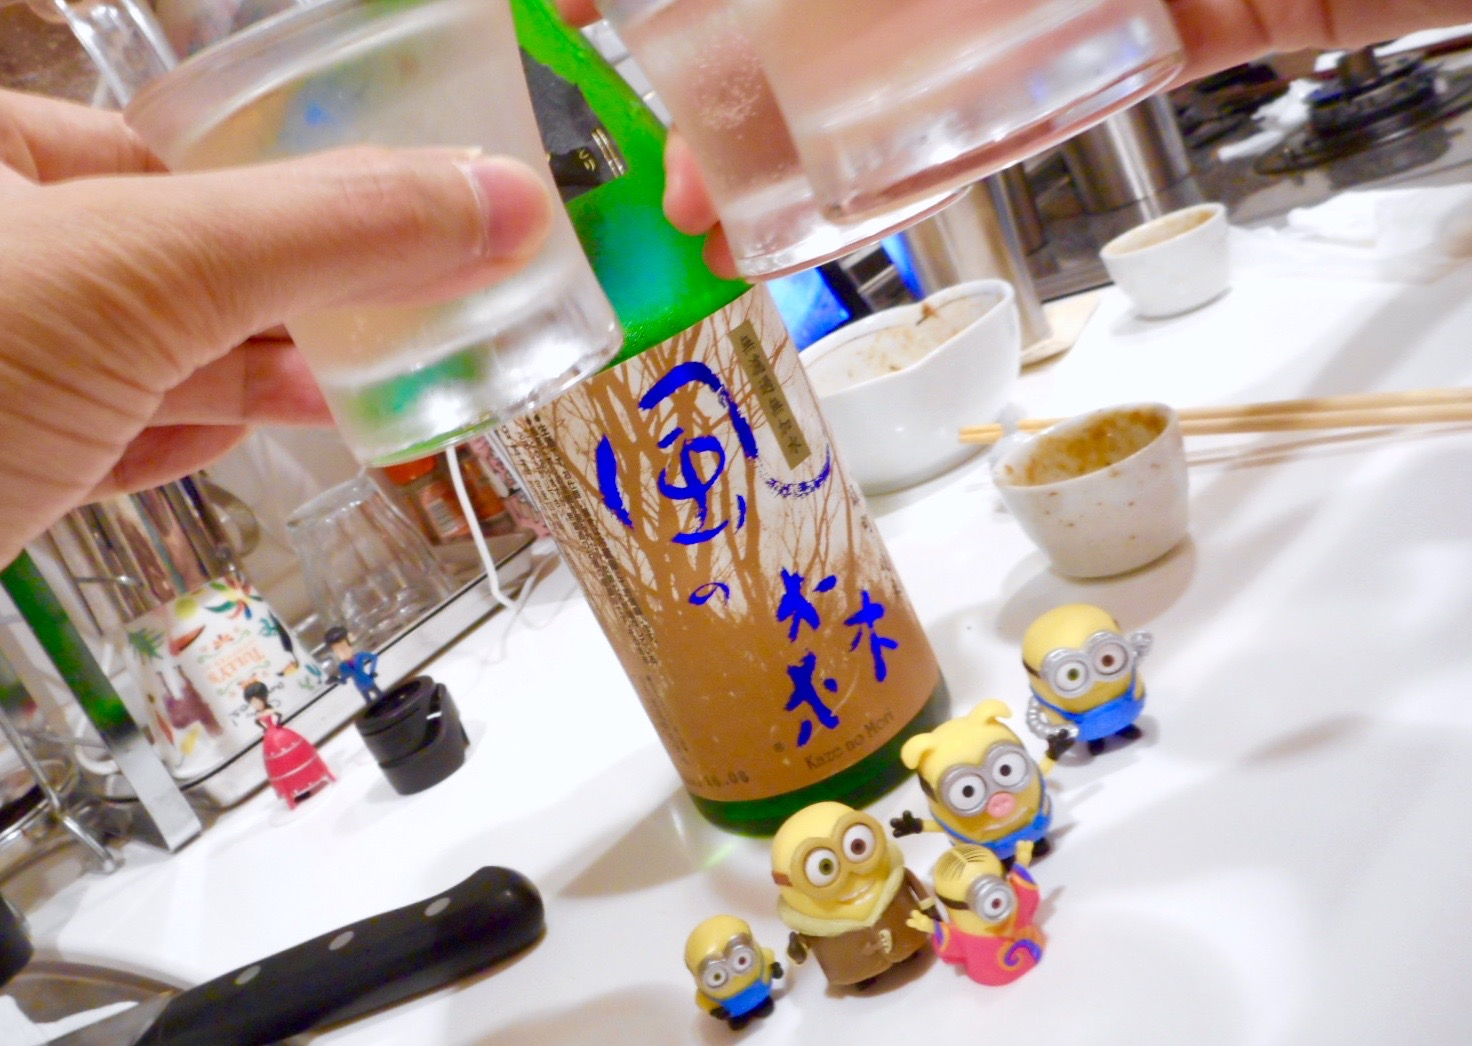 kazenomori_ikakitori_omachi80_27by1.jpg